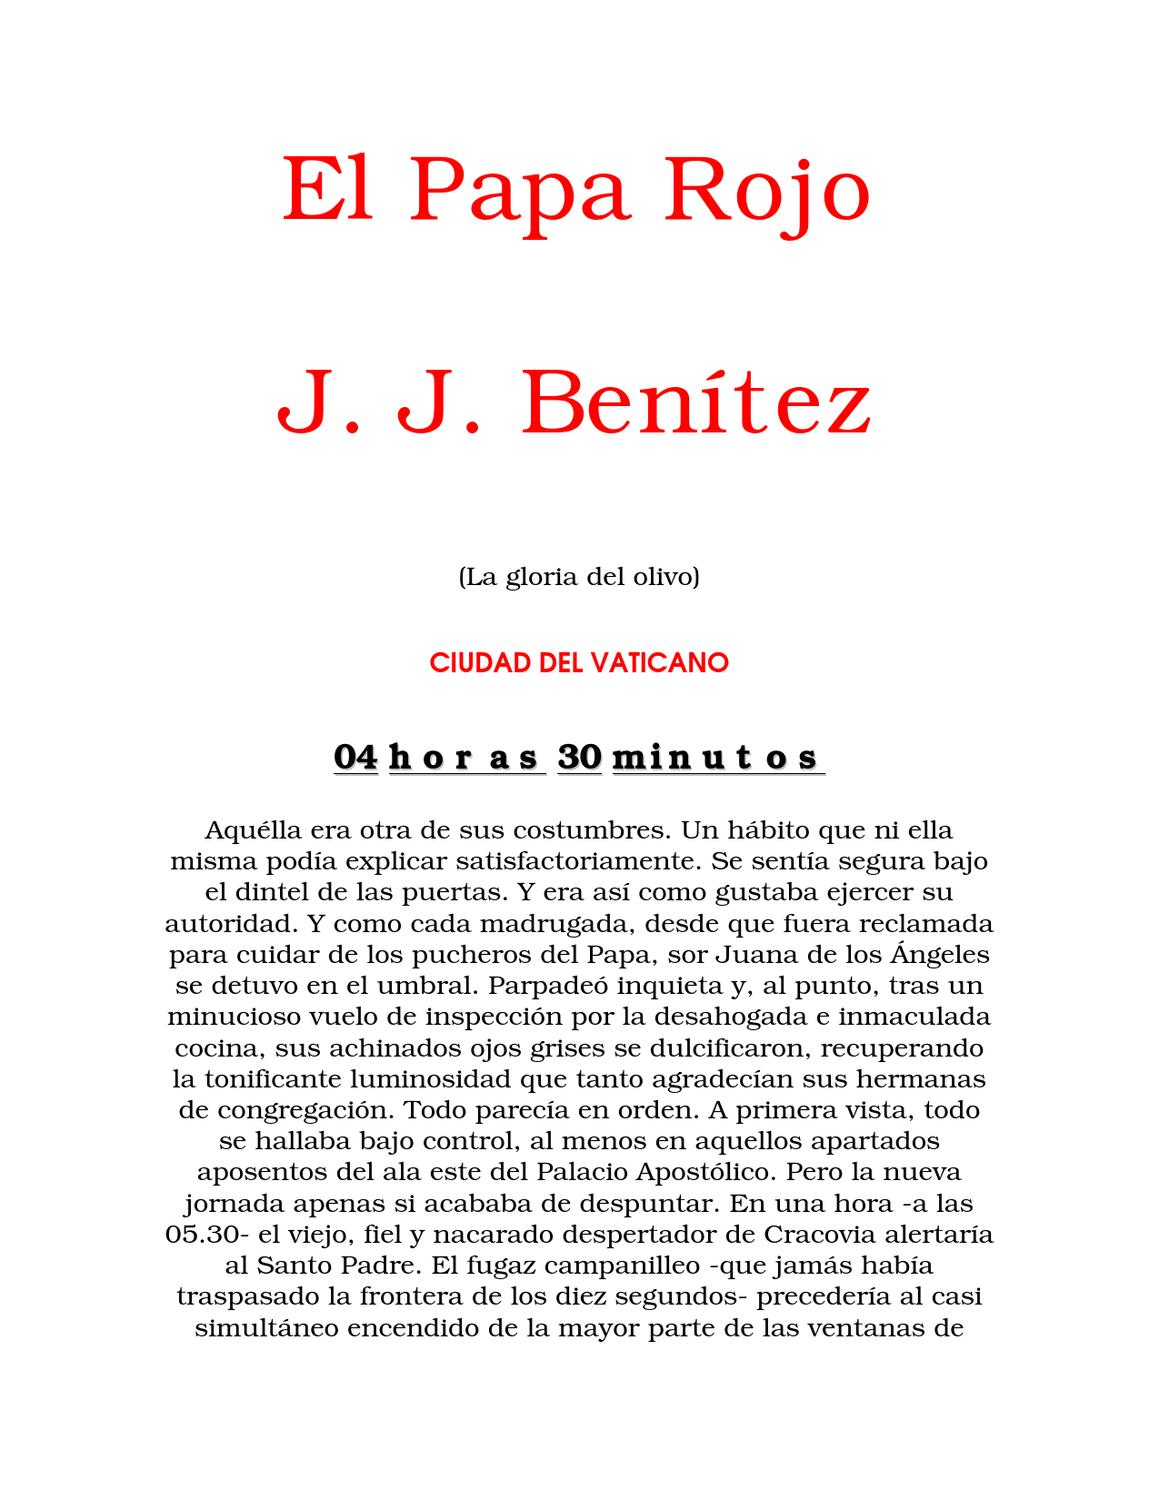 J J BENITEZ EL PAPA ROJO by Mario Oliva - issuu 8e4db908134